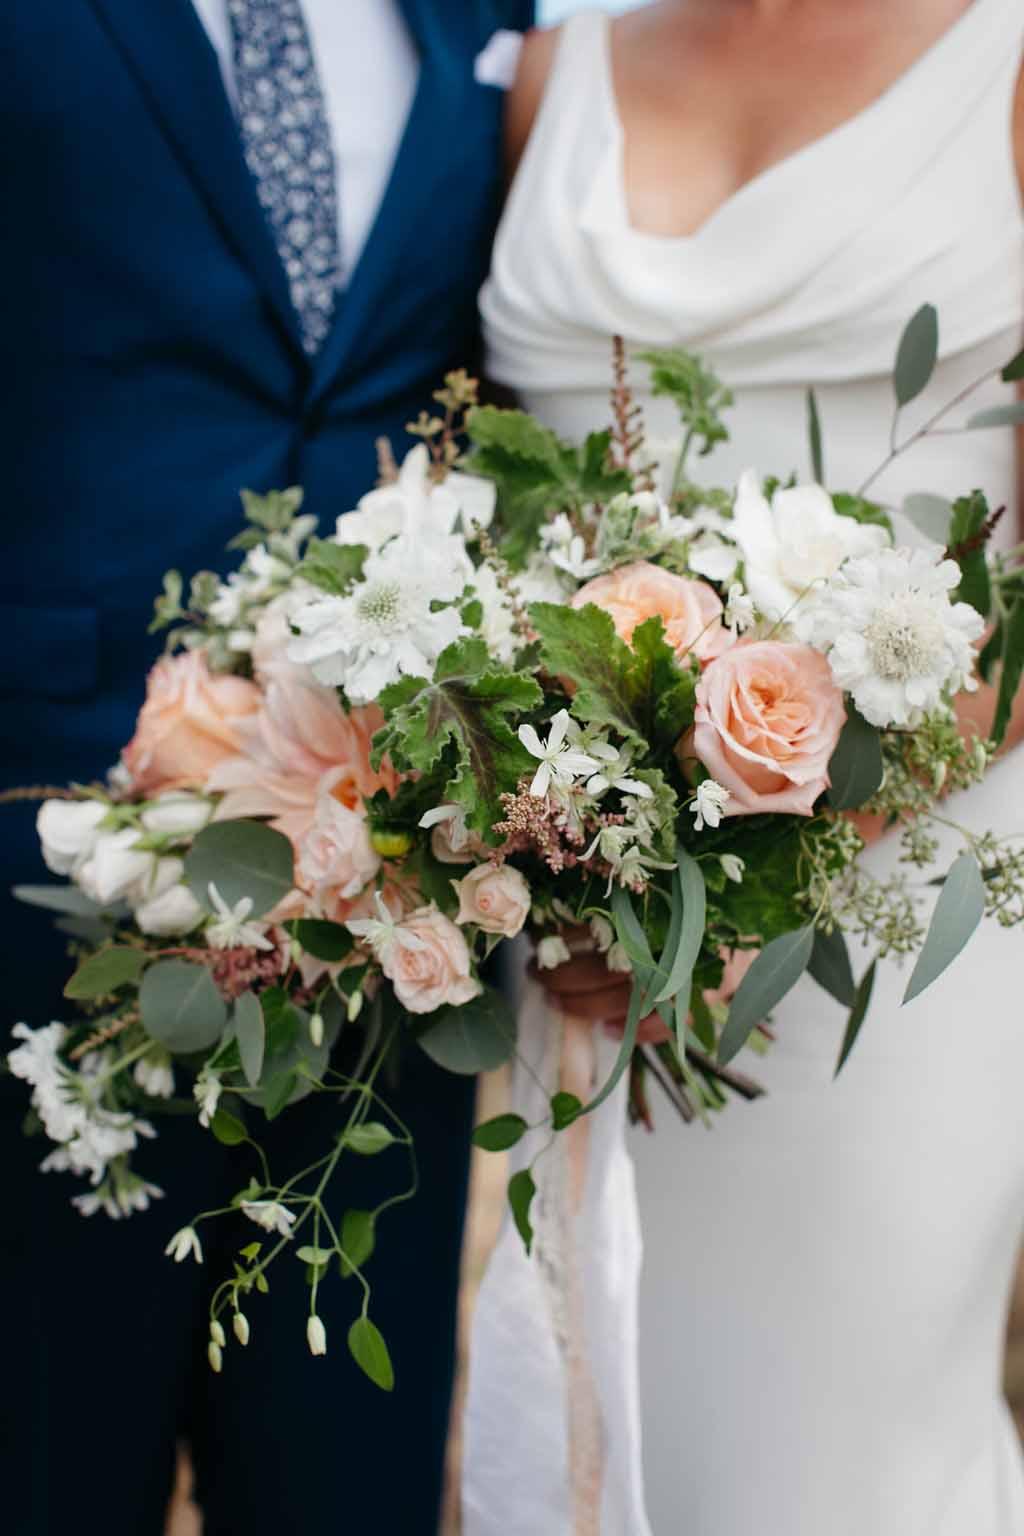 Bridal bouquet featuring peach roses, cream spray roses, trailing greenery - Elegant Seattle Garden Wedding by Flora Nova Design Seattle